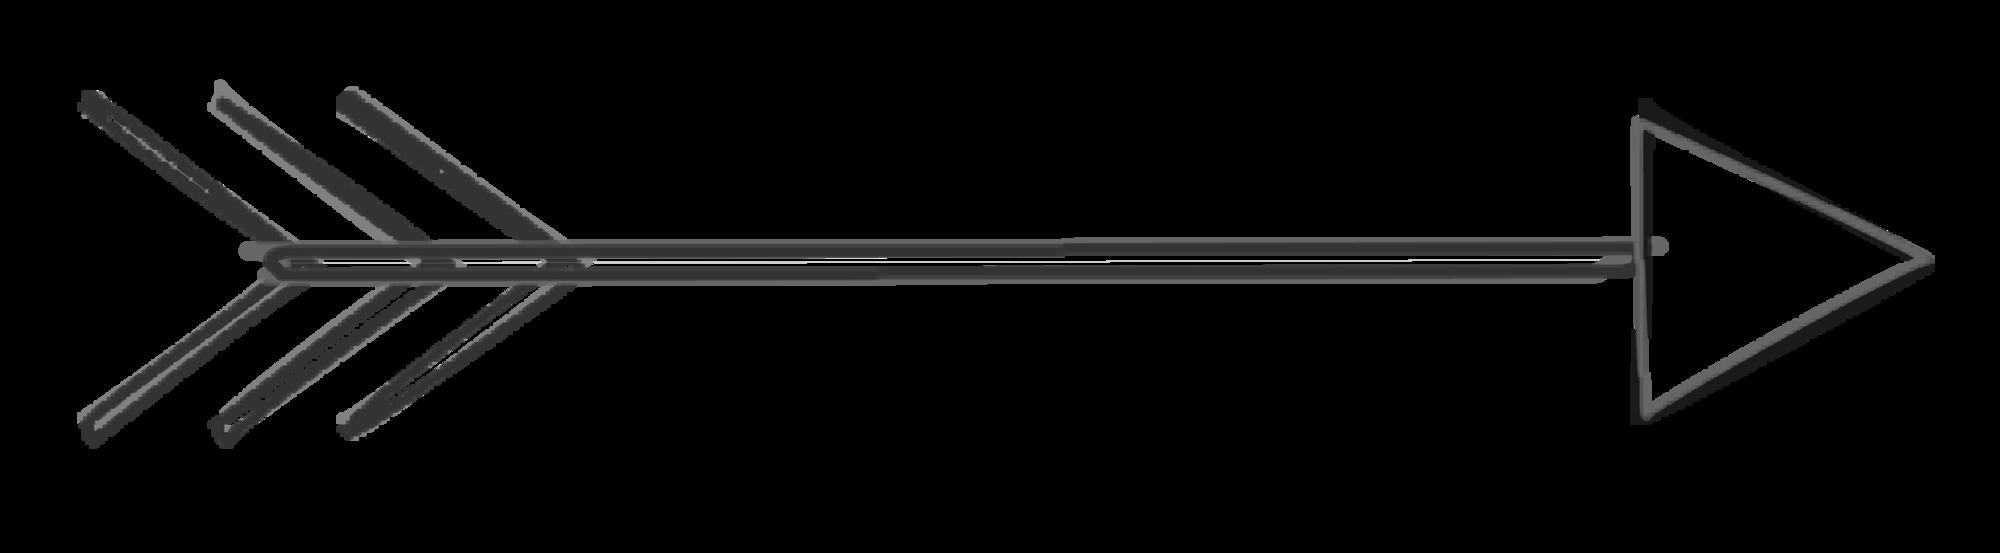 Arrows clipart transparent background. Image a db e